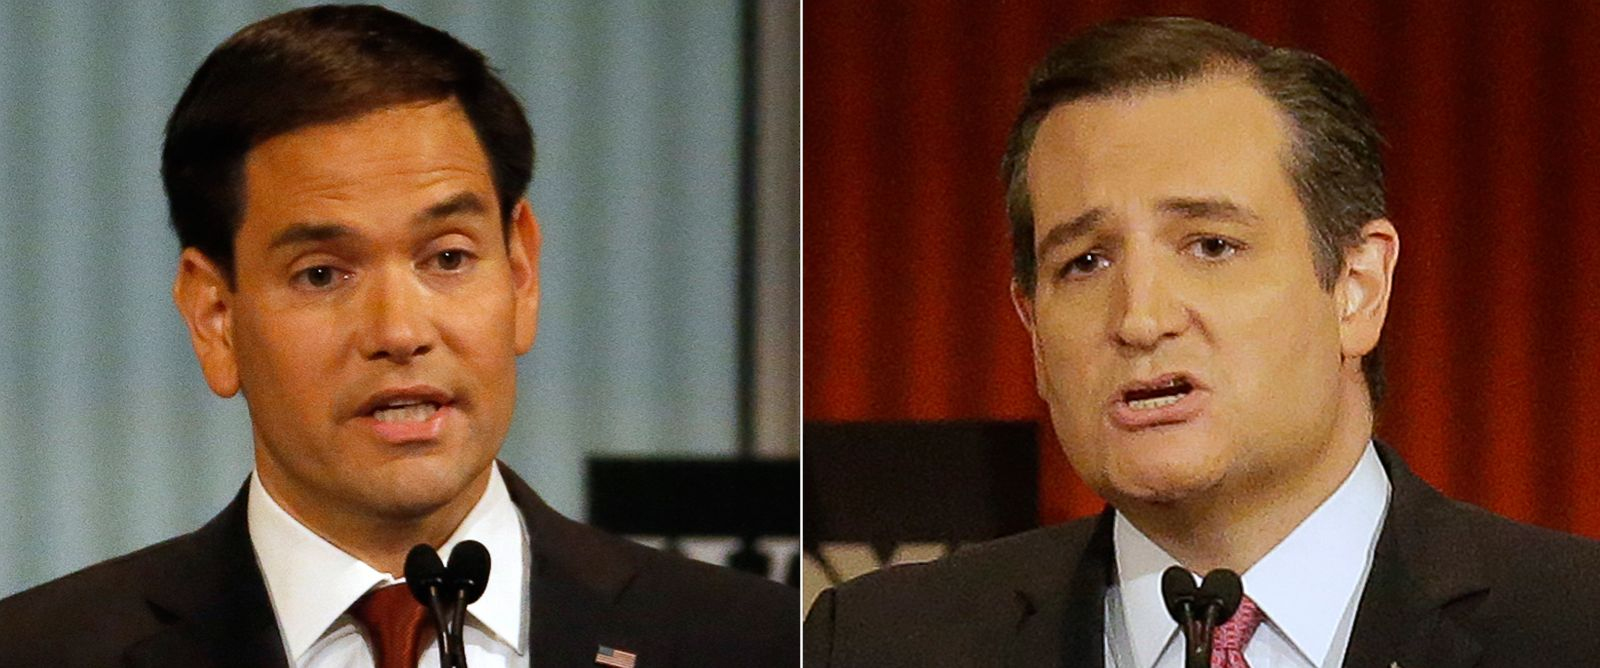 PHOTO: (L-R) Sen. Marco Rubio, R-Fla., and Ted Cruz speak during Republican presidential debate in Milwaukee, Nov. 10, 2015.